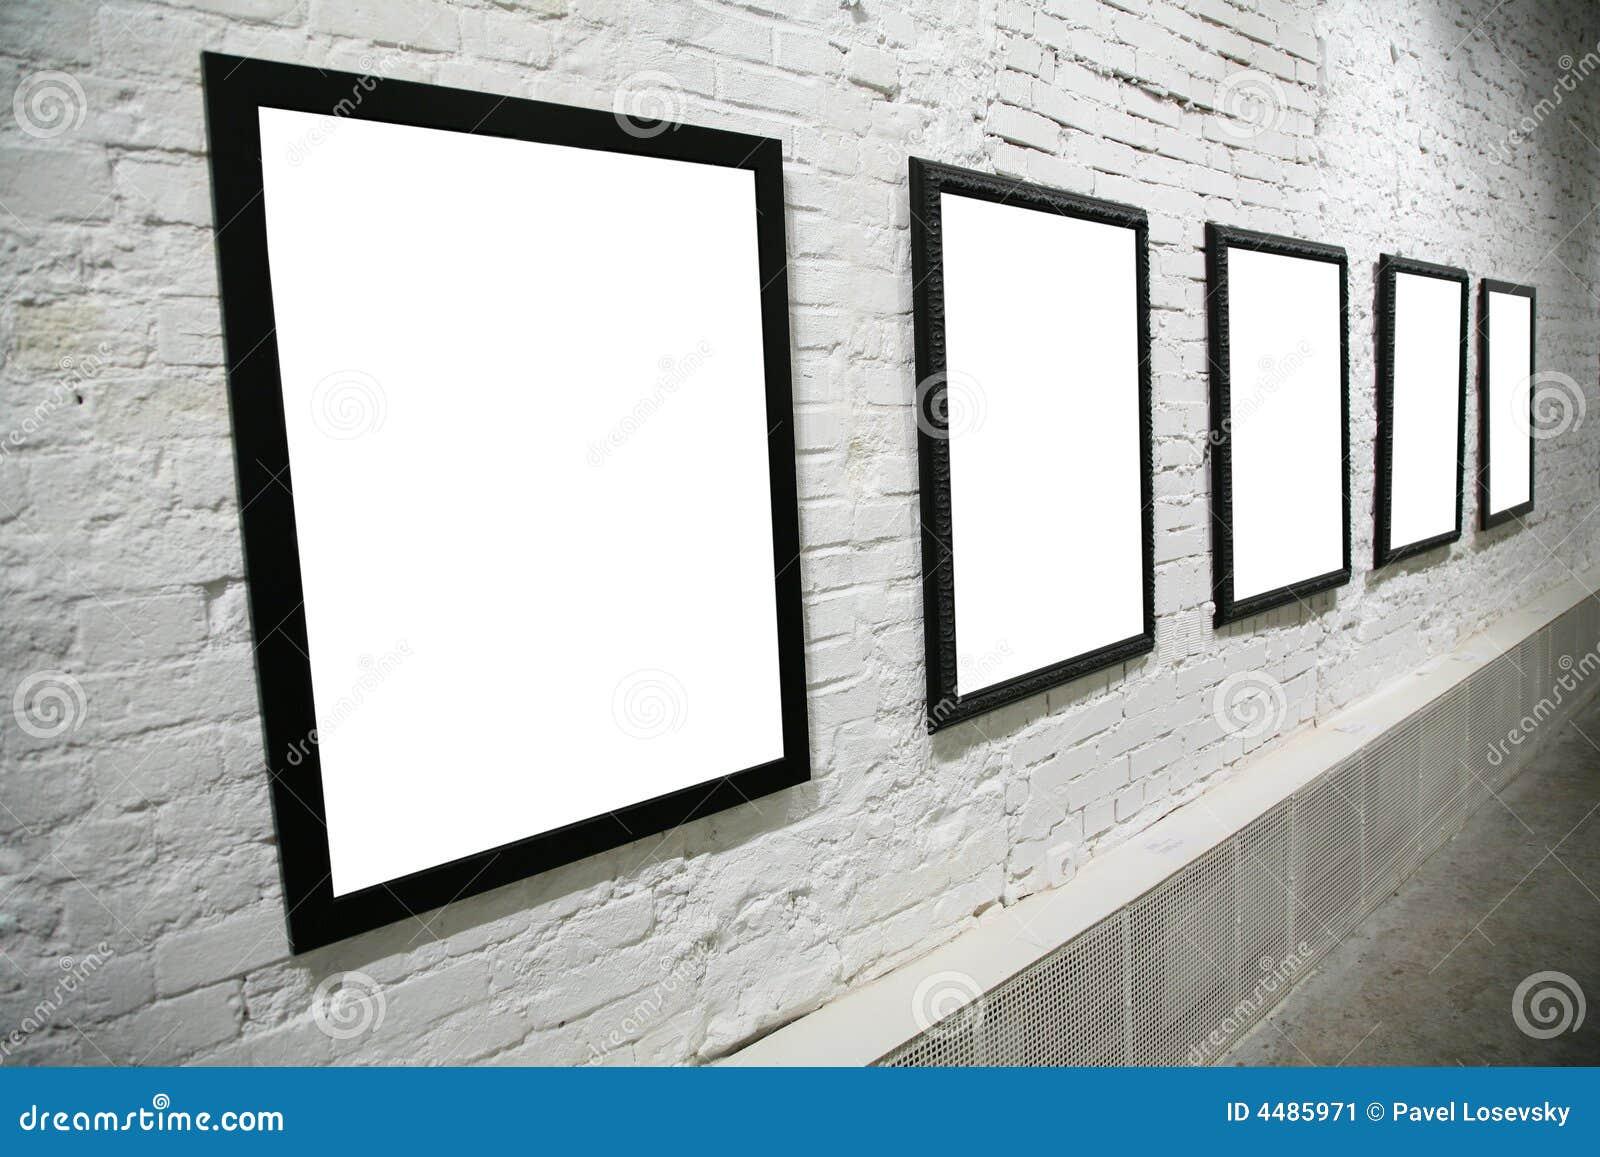 row of black frames on white brick wall